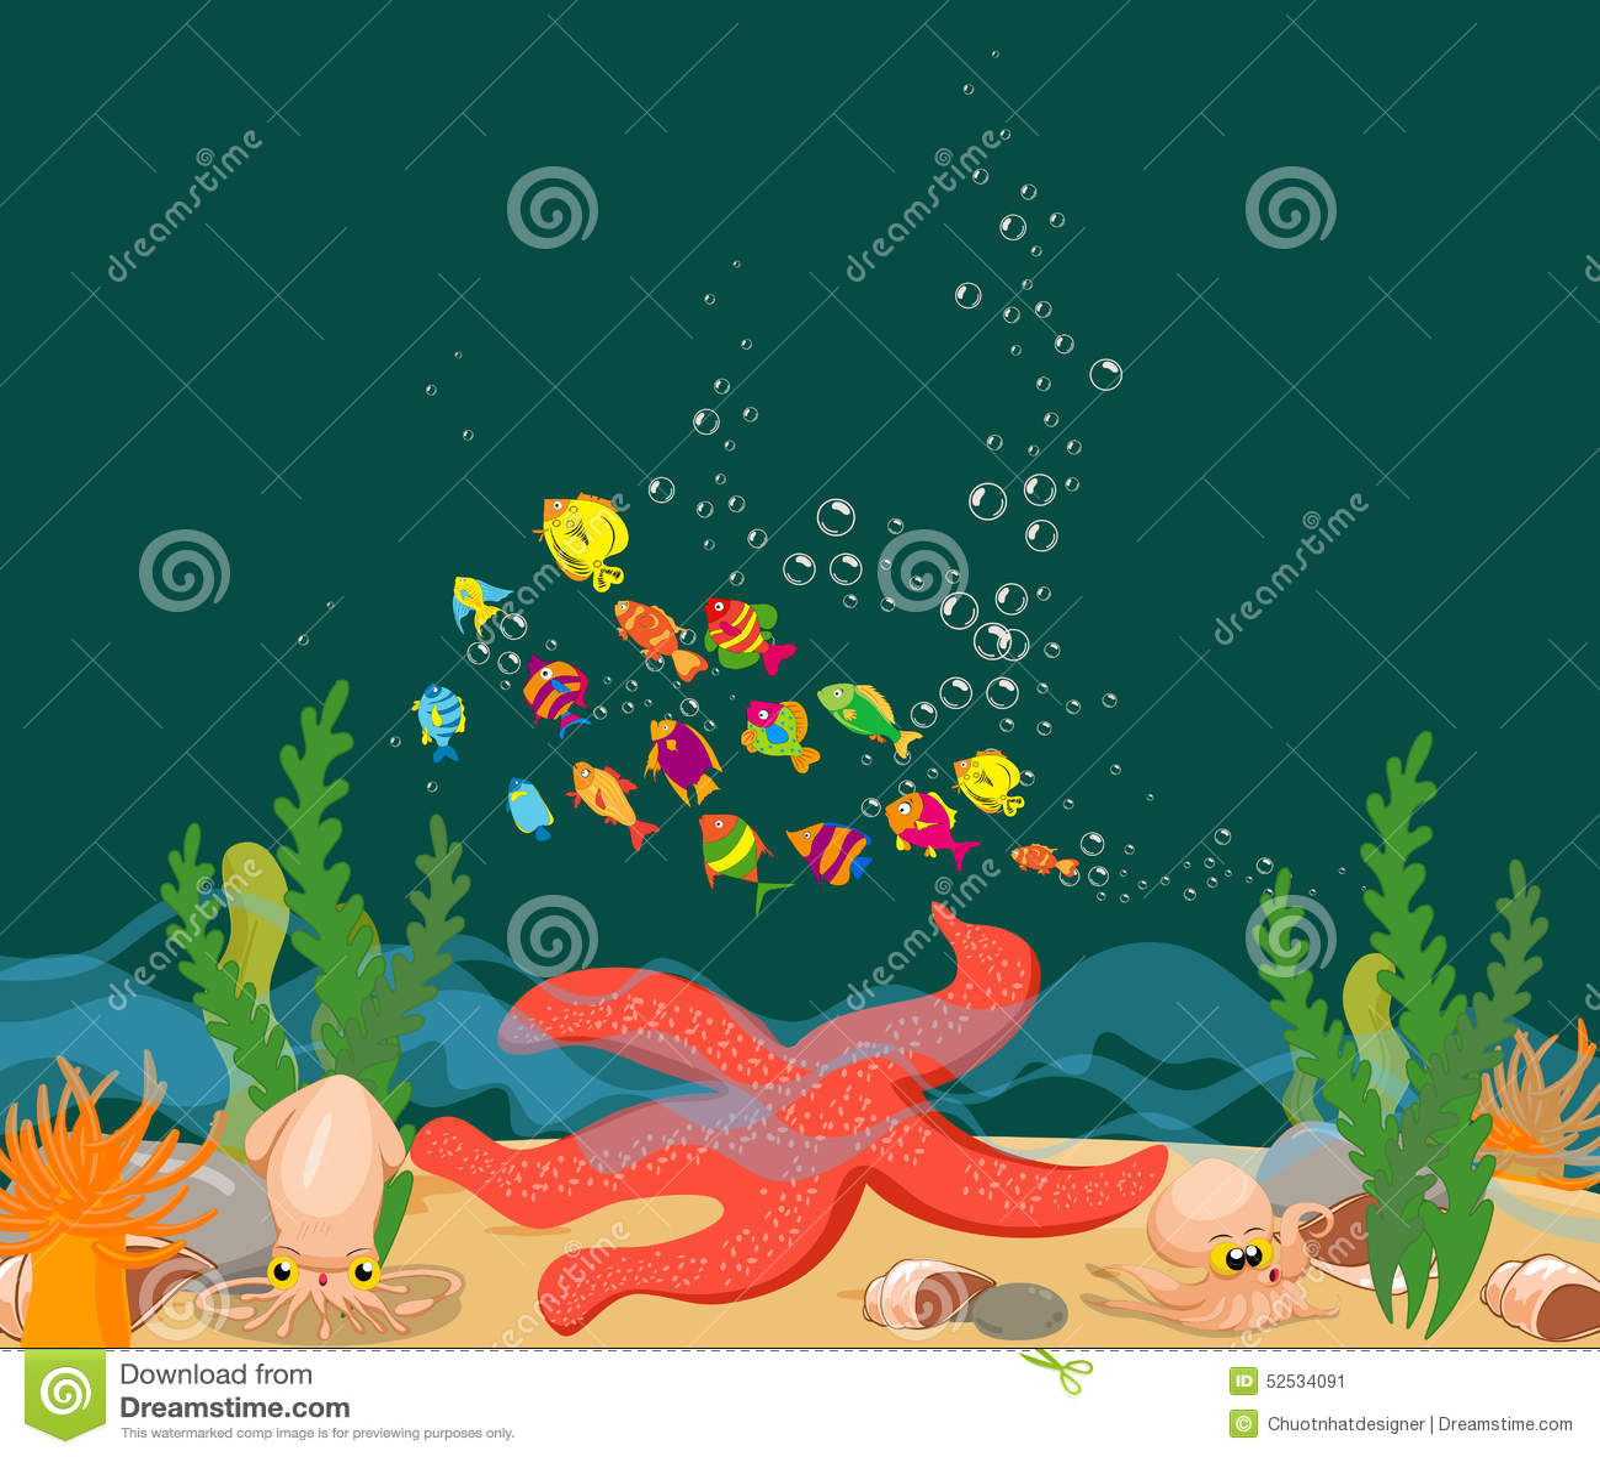 Stock Illustration Big Starfish Under Sea Enjoyed Life Ocean Fishs Des...